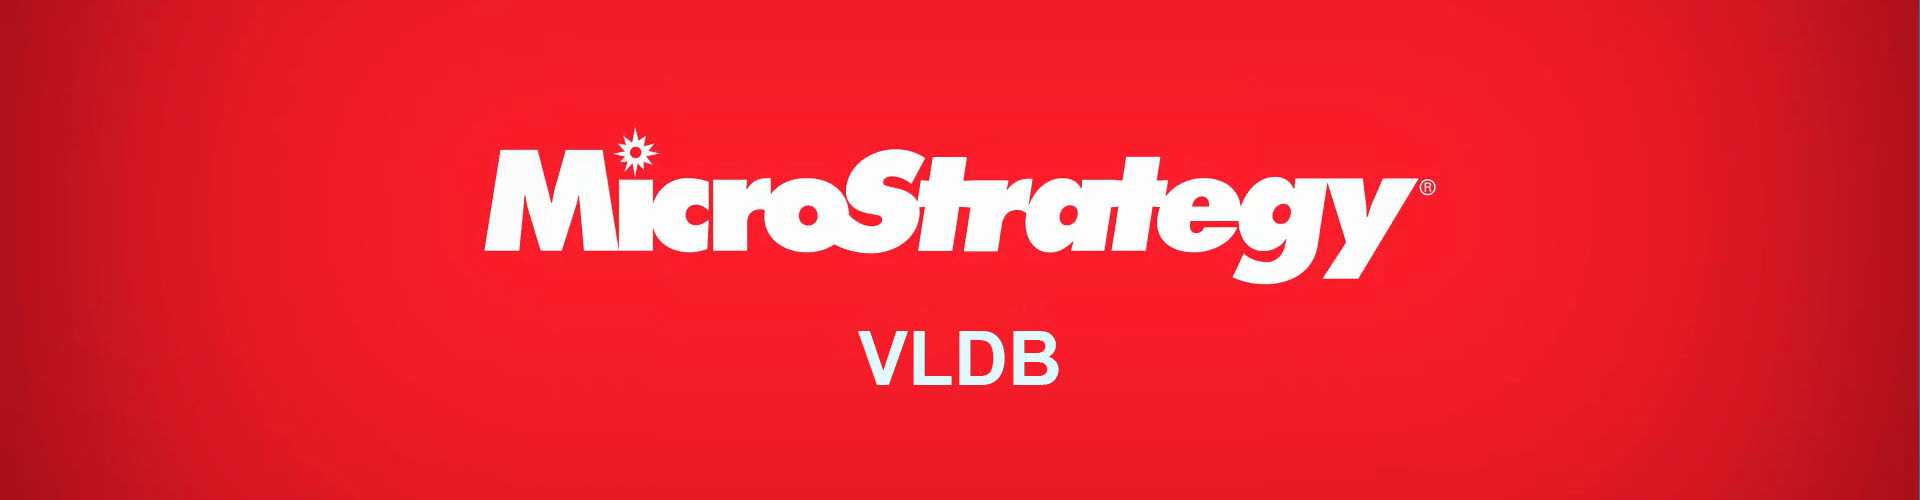 MicroStrategy VLDB